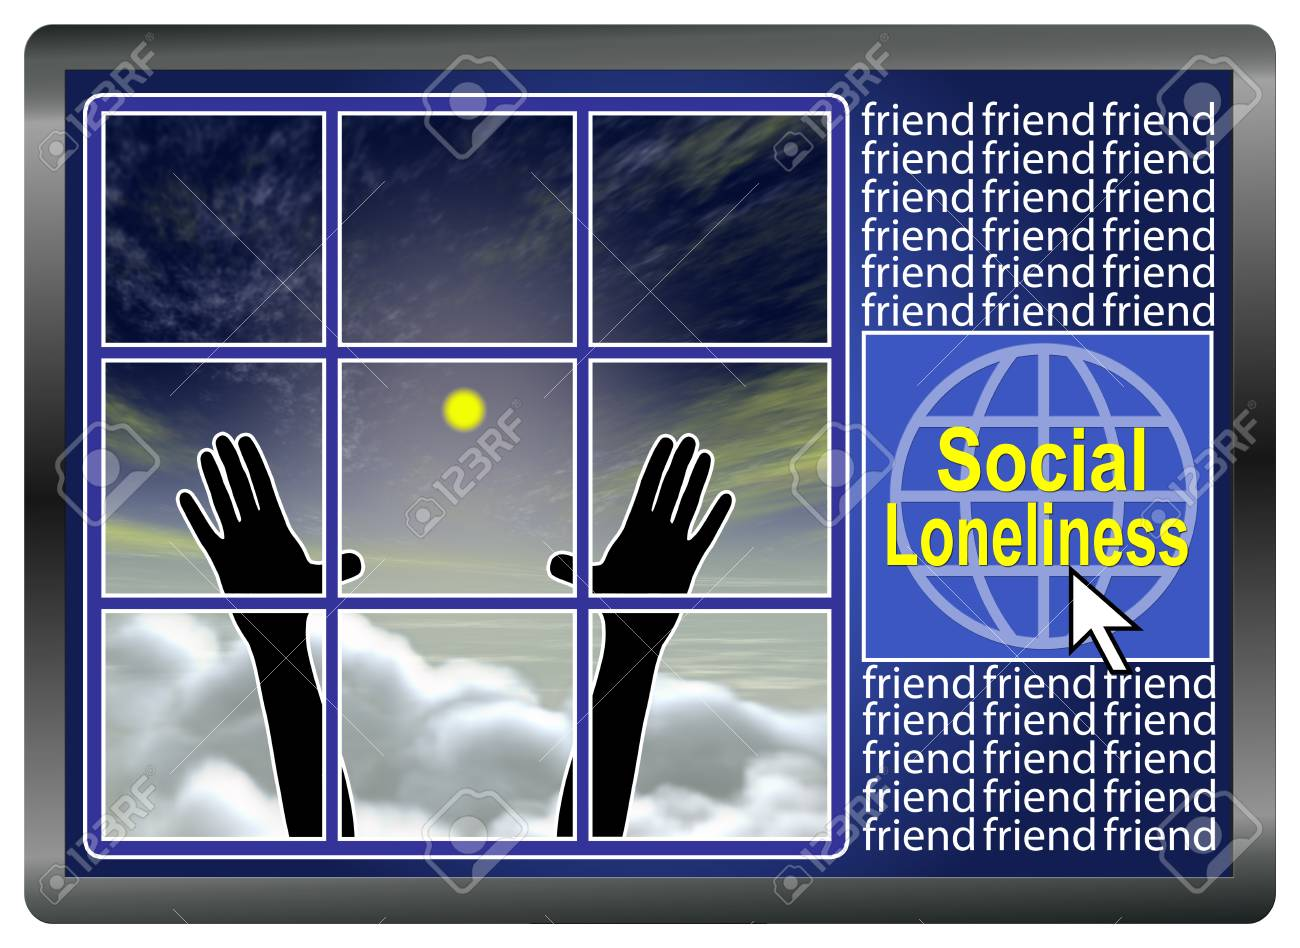 Of media consequences negative social 8 Negative